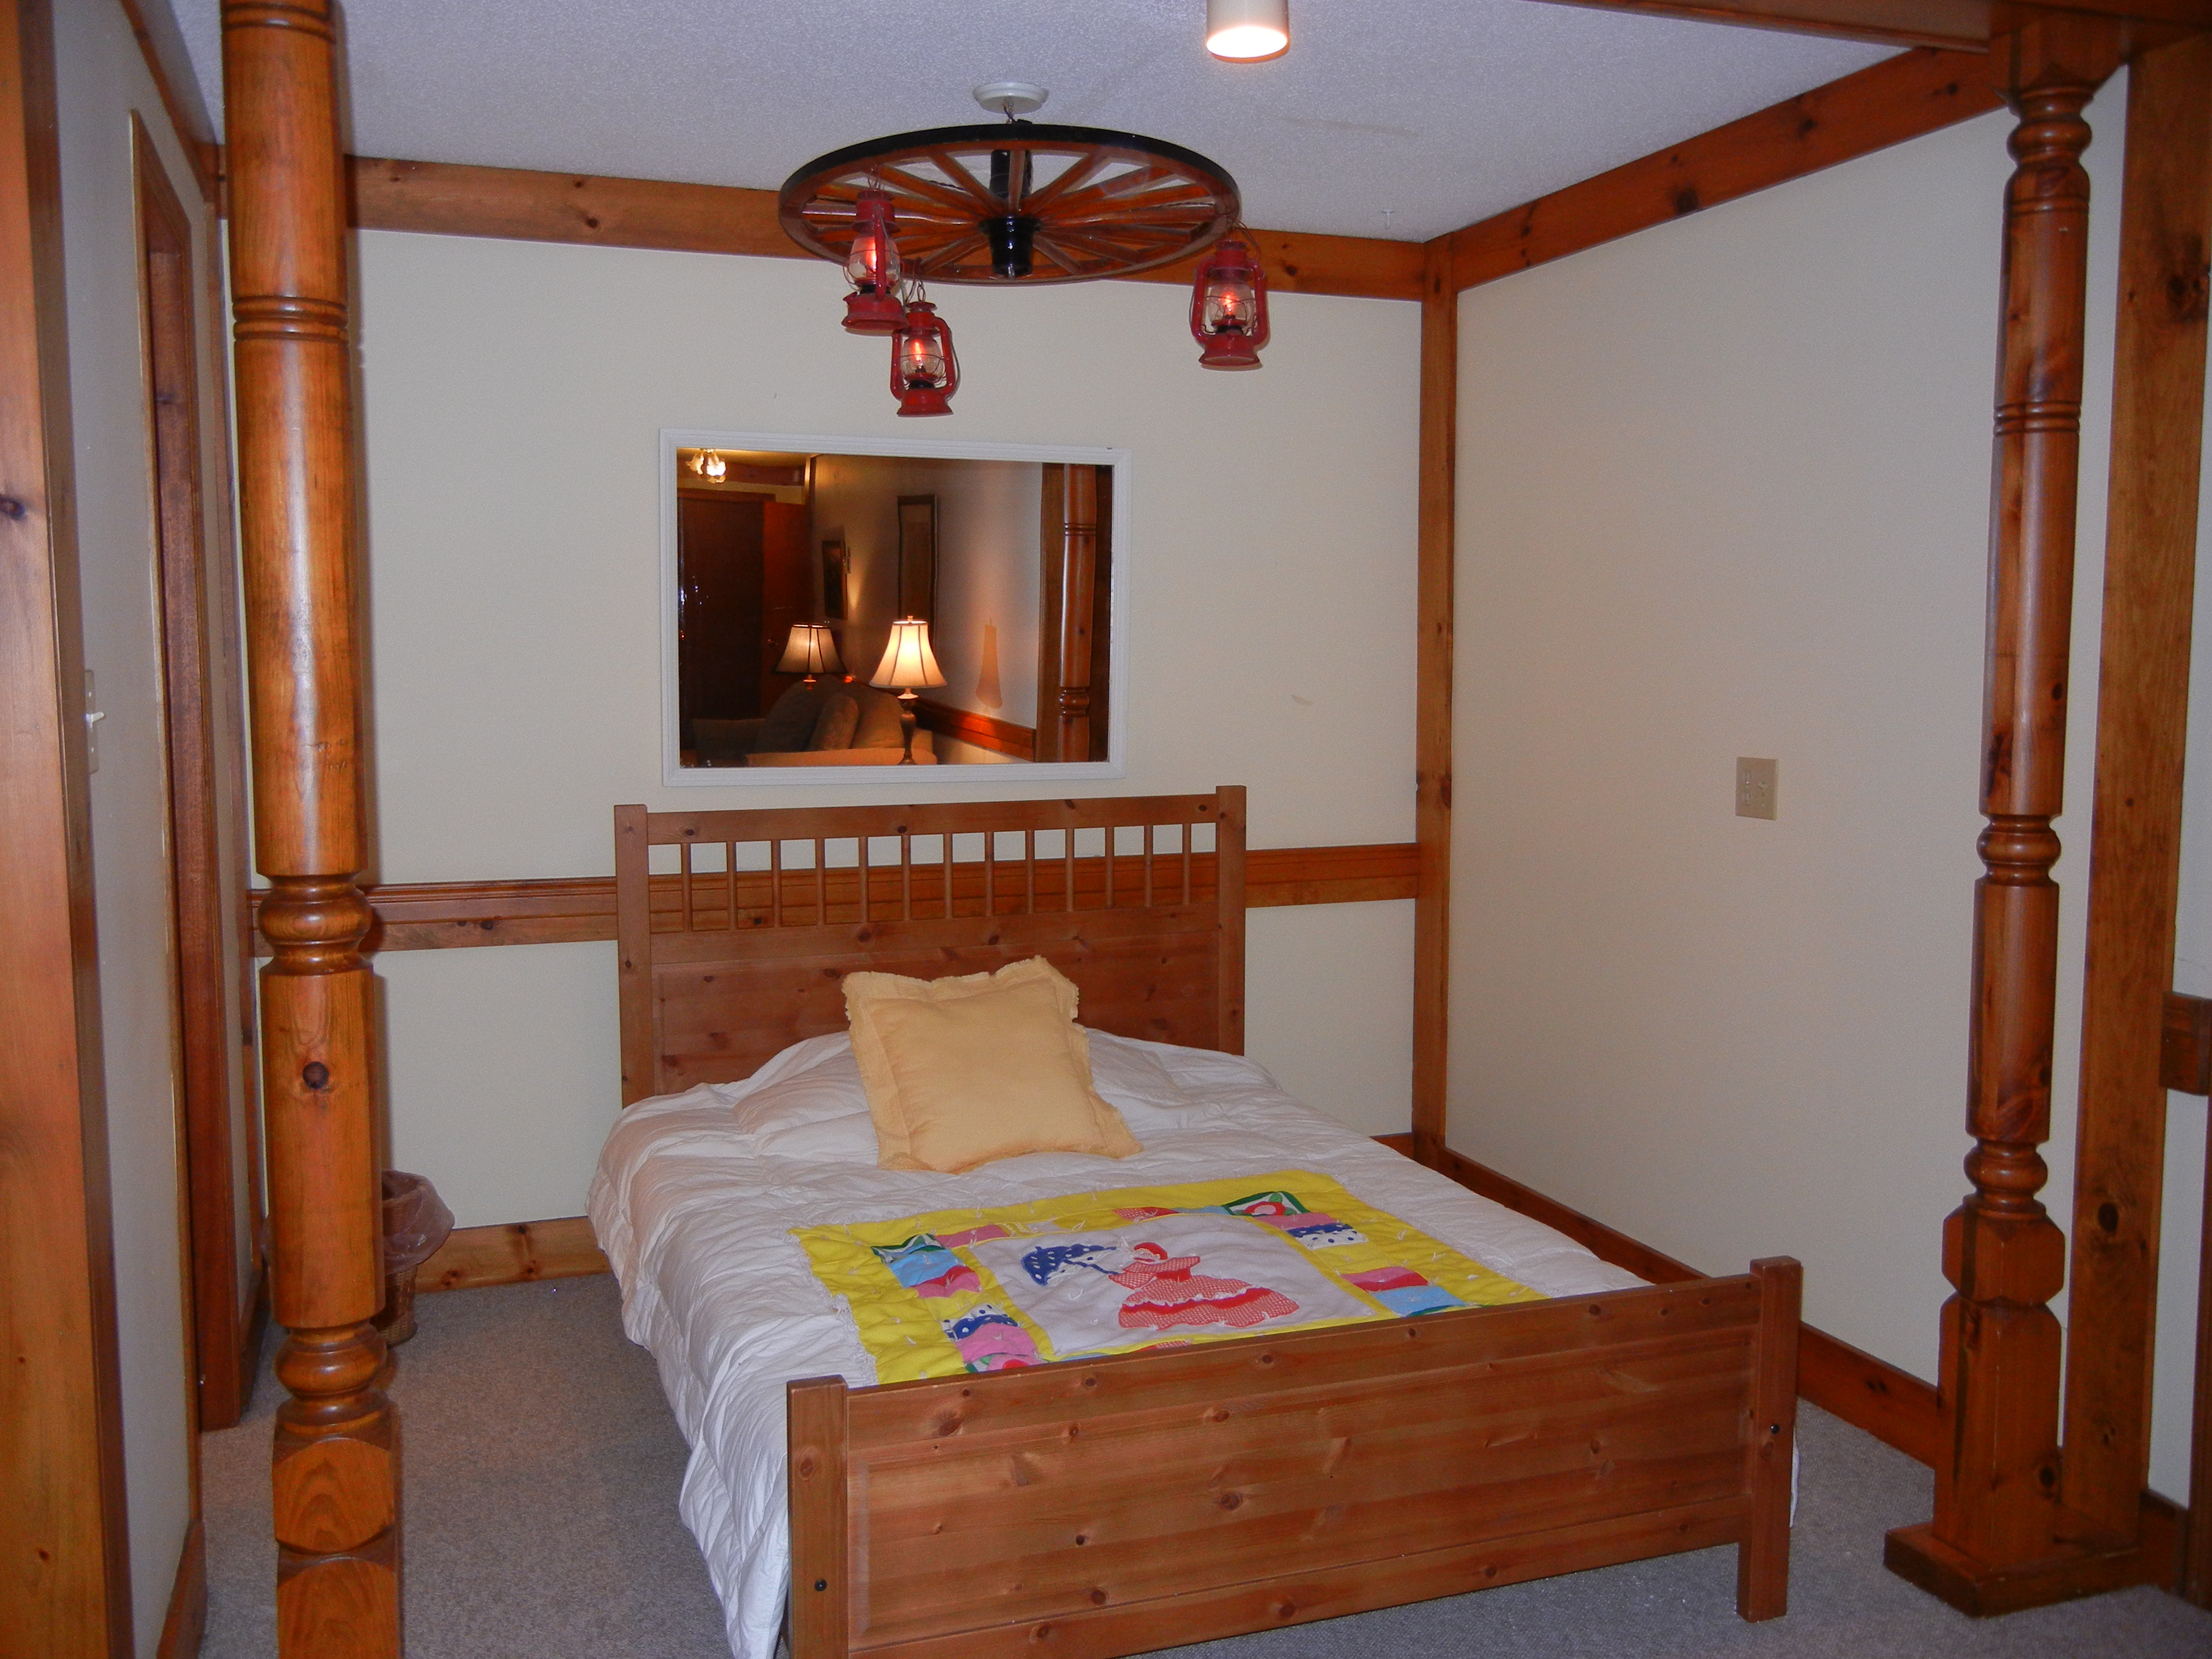 30 Kids Bed